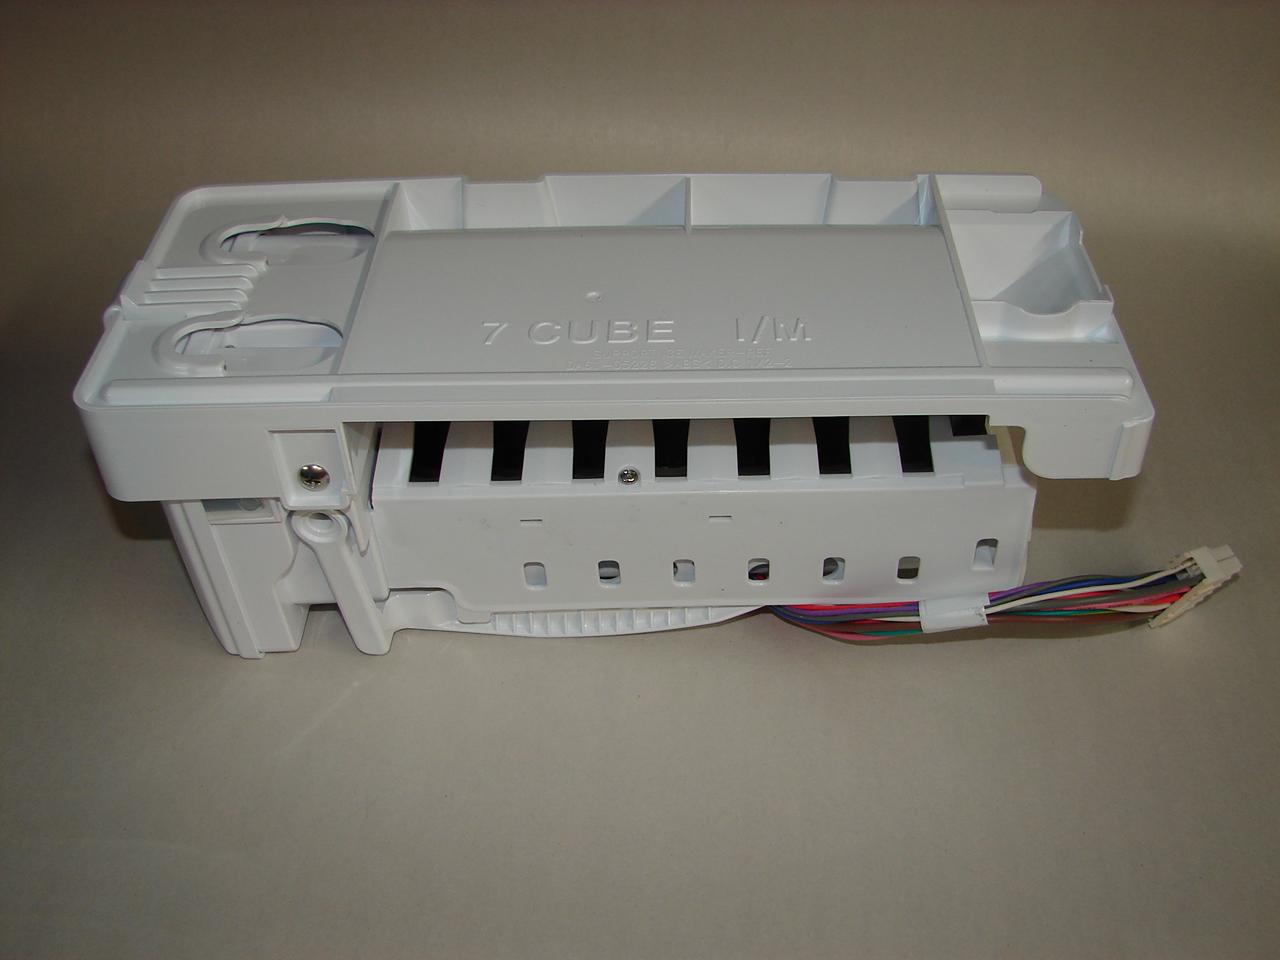 Da97 07592a Samsung Refrigerator 7 Cube Icemaker